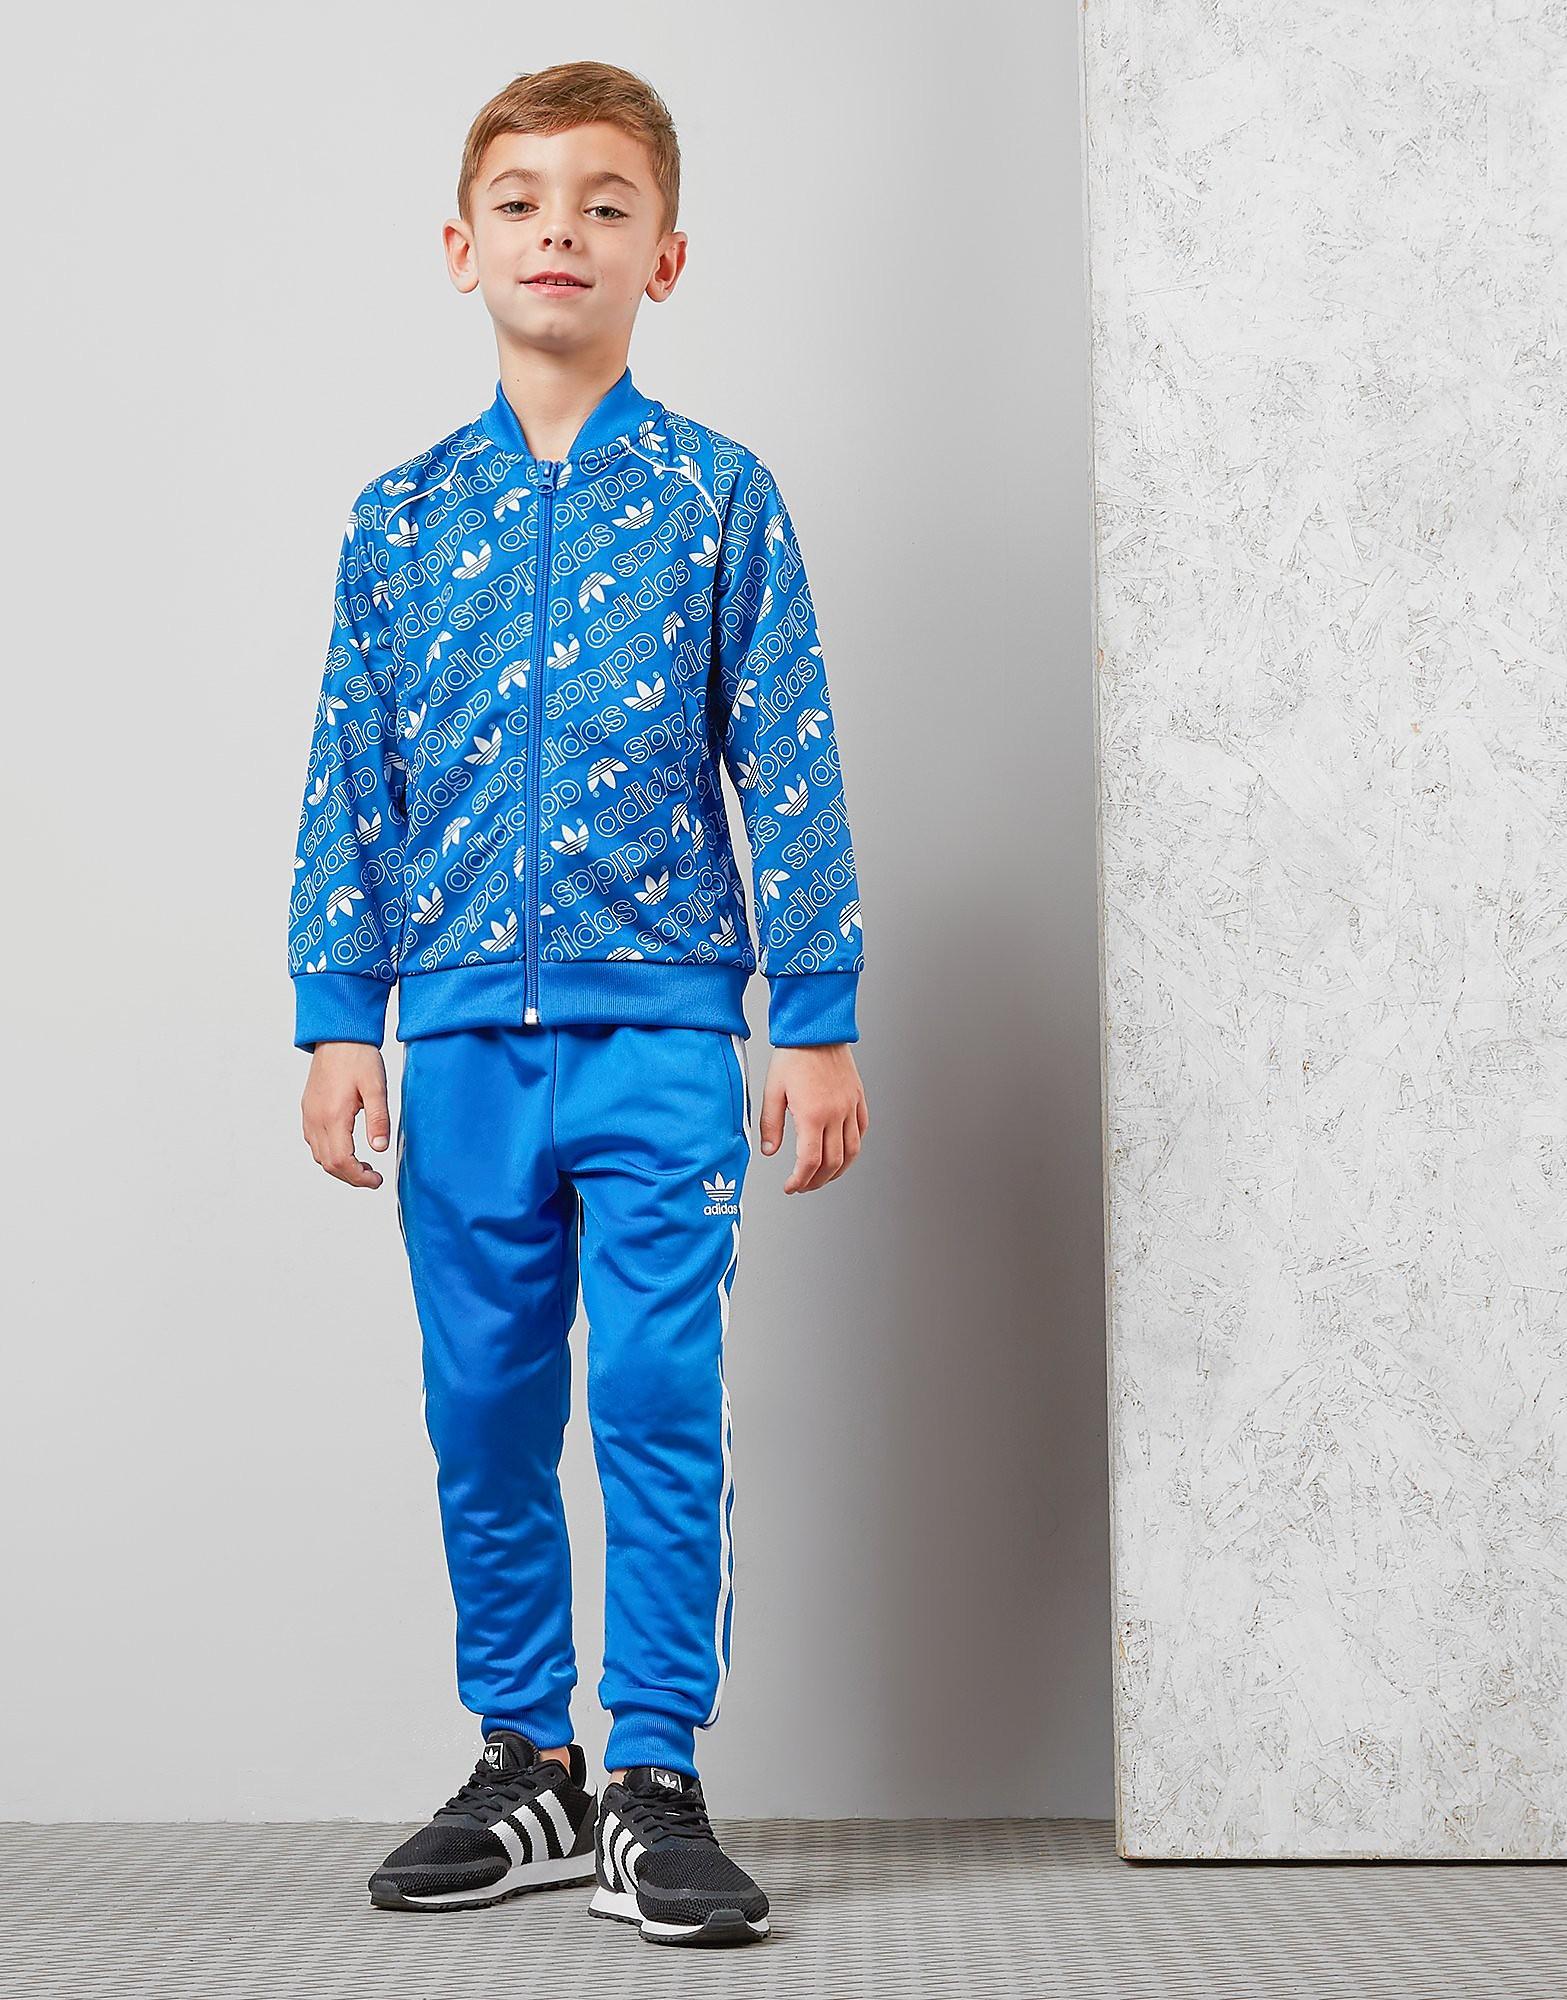 adidas Originals All Over Print Superstar Tracksuit Children - Blau - Kids, Blau